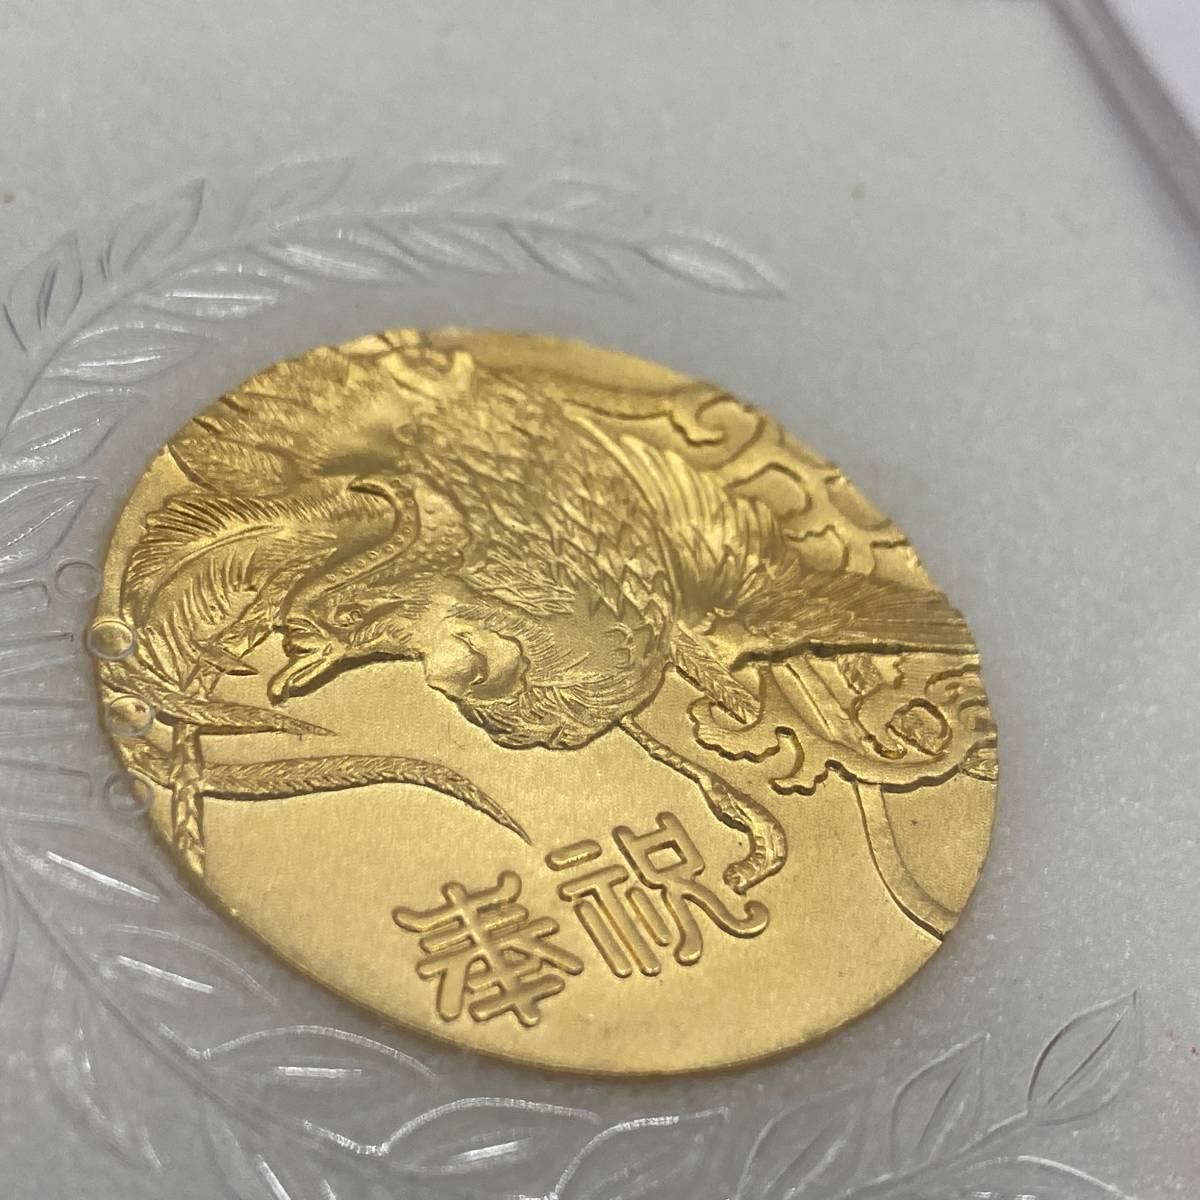 【1005】 天皇陛下喜寿 昭和53年 奉祝 記念メダル_画像4